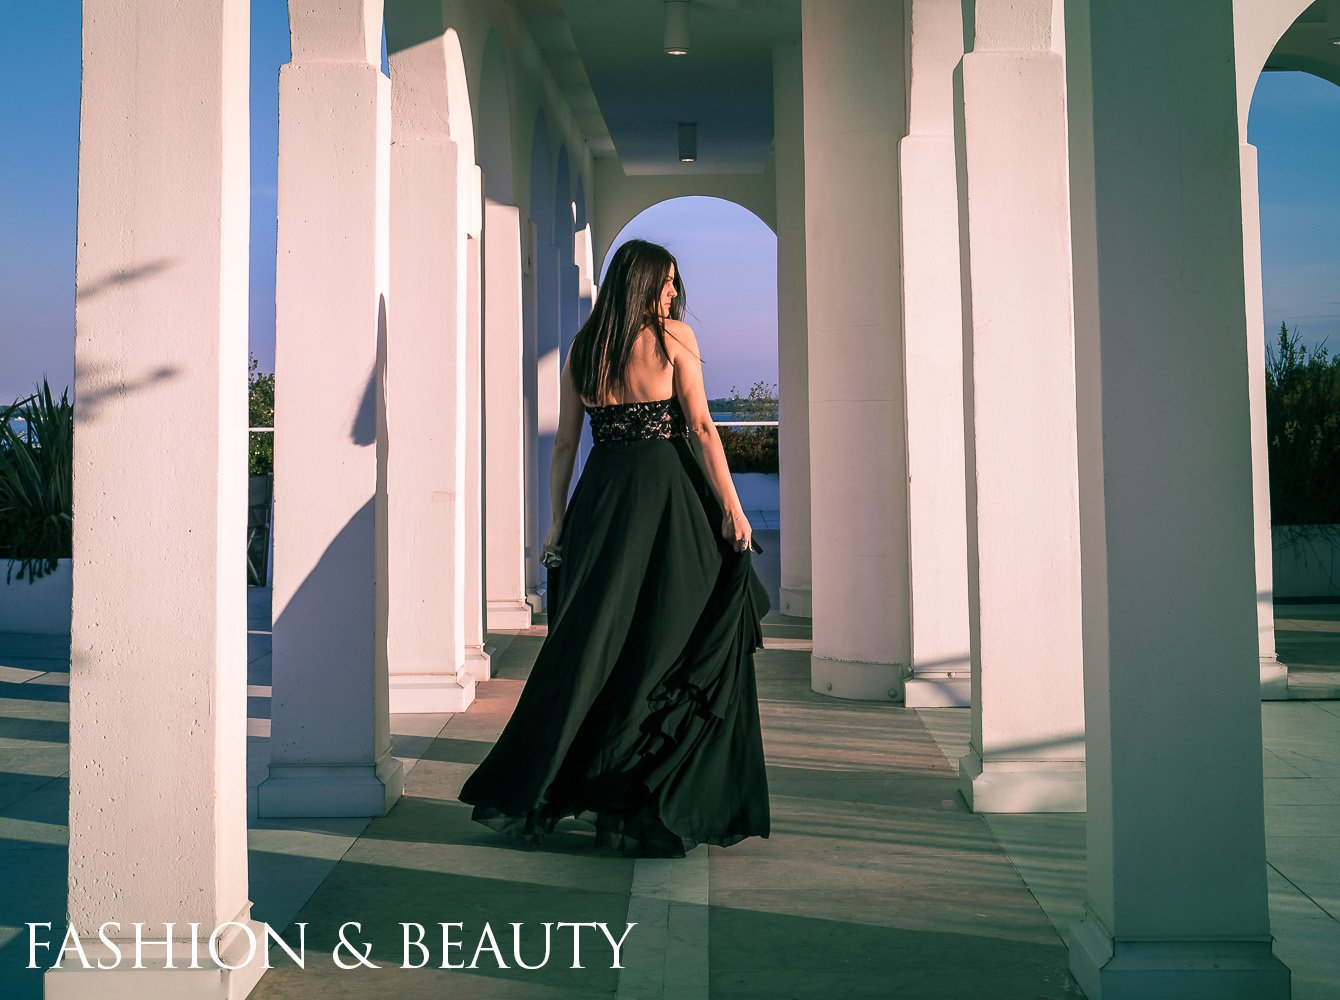 Erica Tonolli - Fotografia commerciale beauty